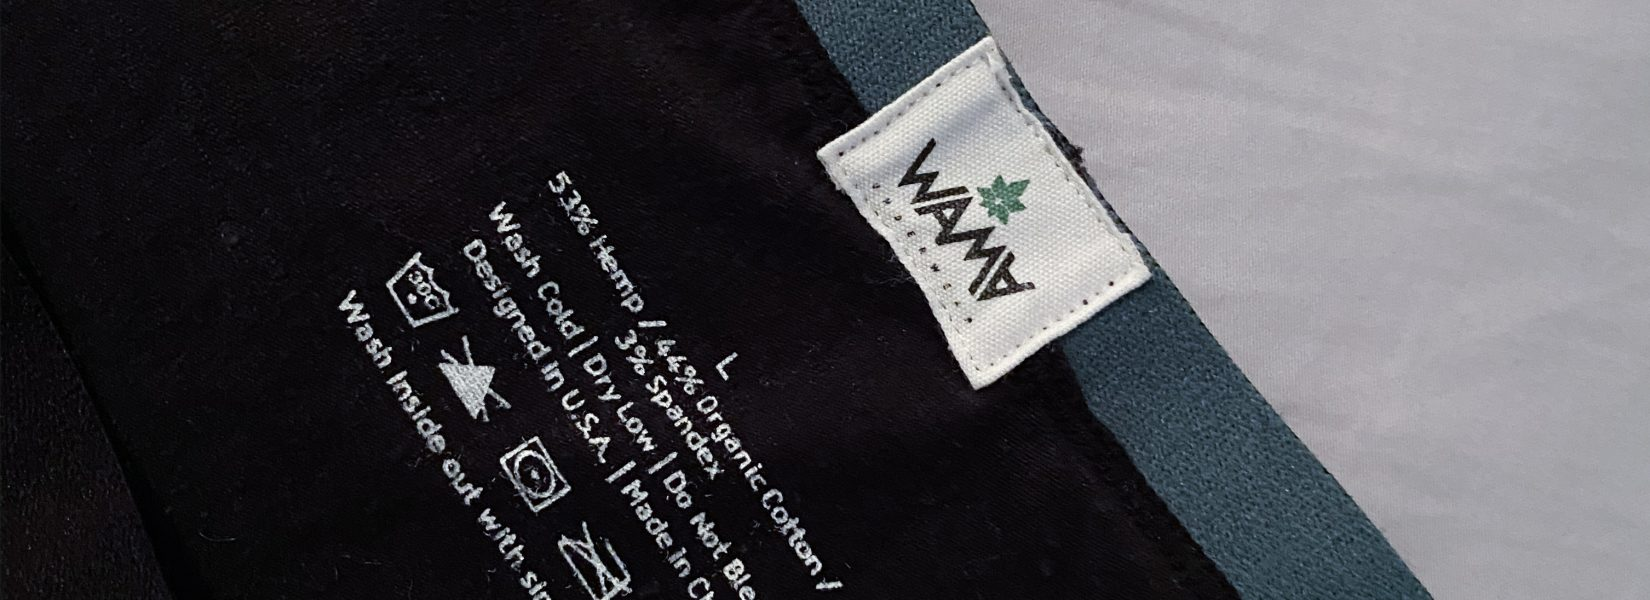 WAMA Hemp Underwear Review *